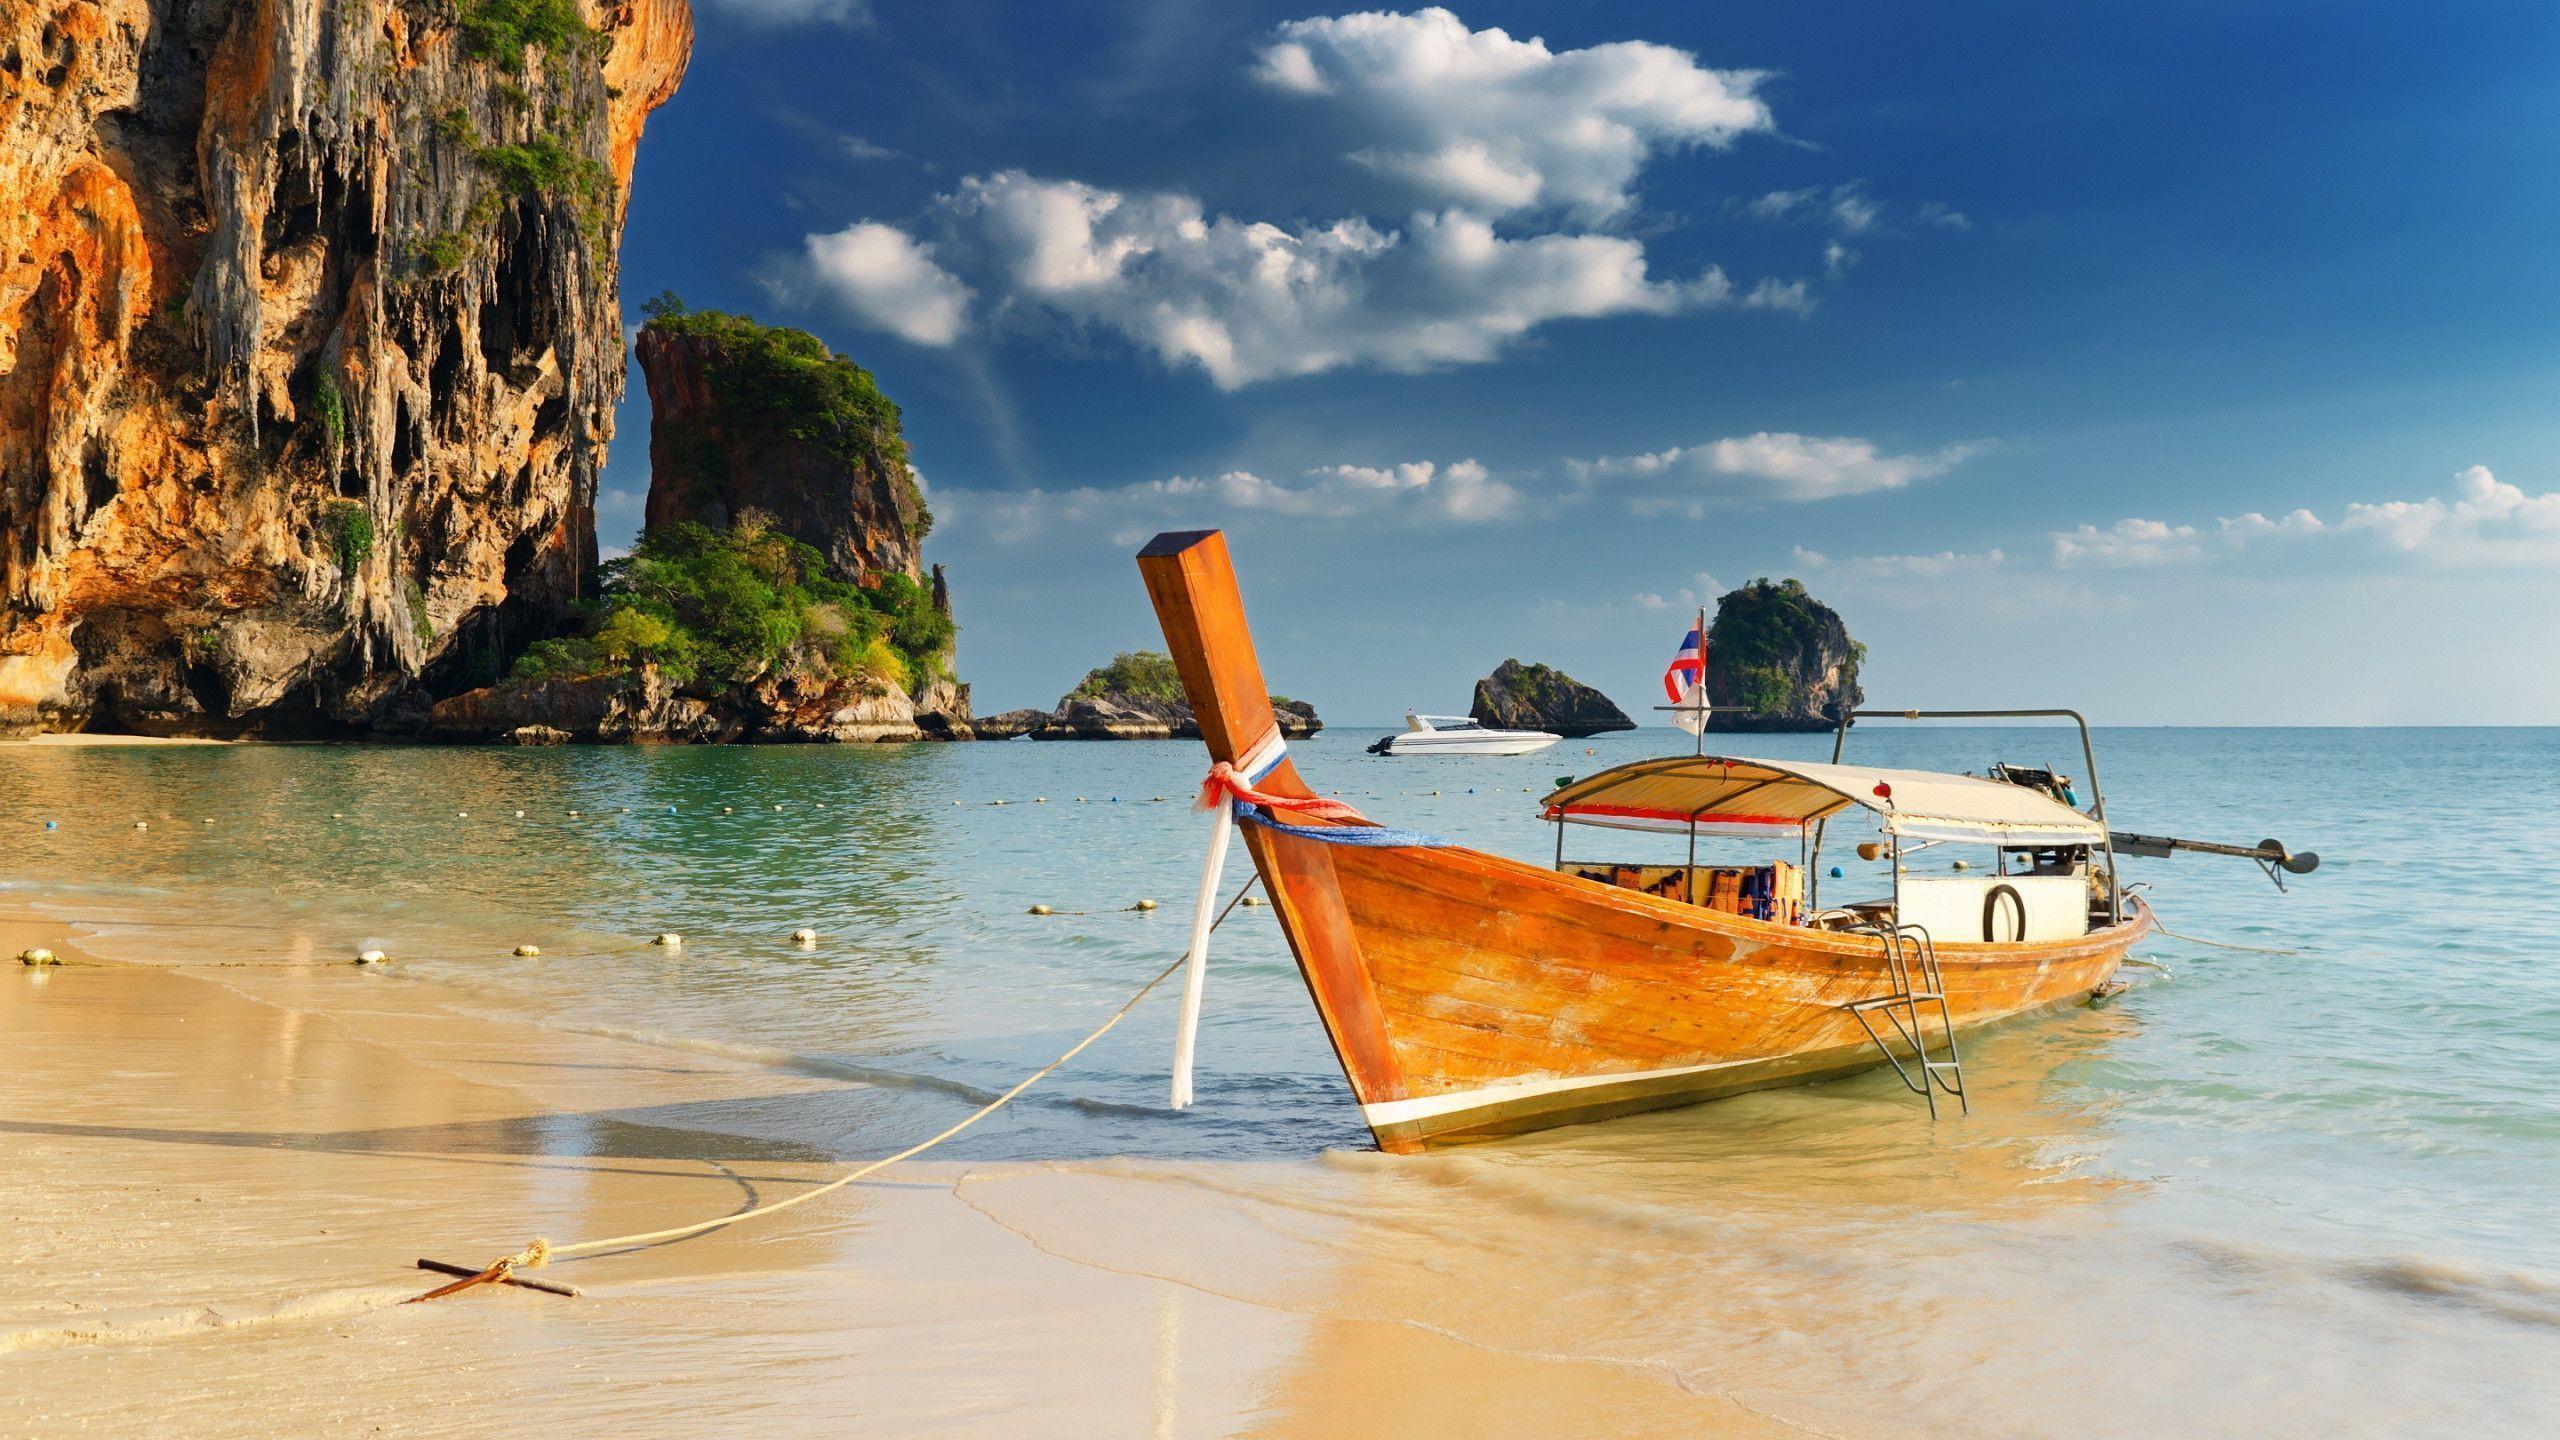 Thailand Beach HD Wallpapers - HD Wallpapers Inn